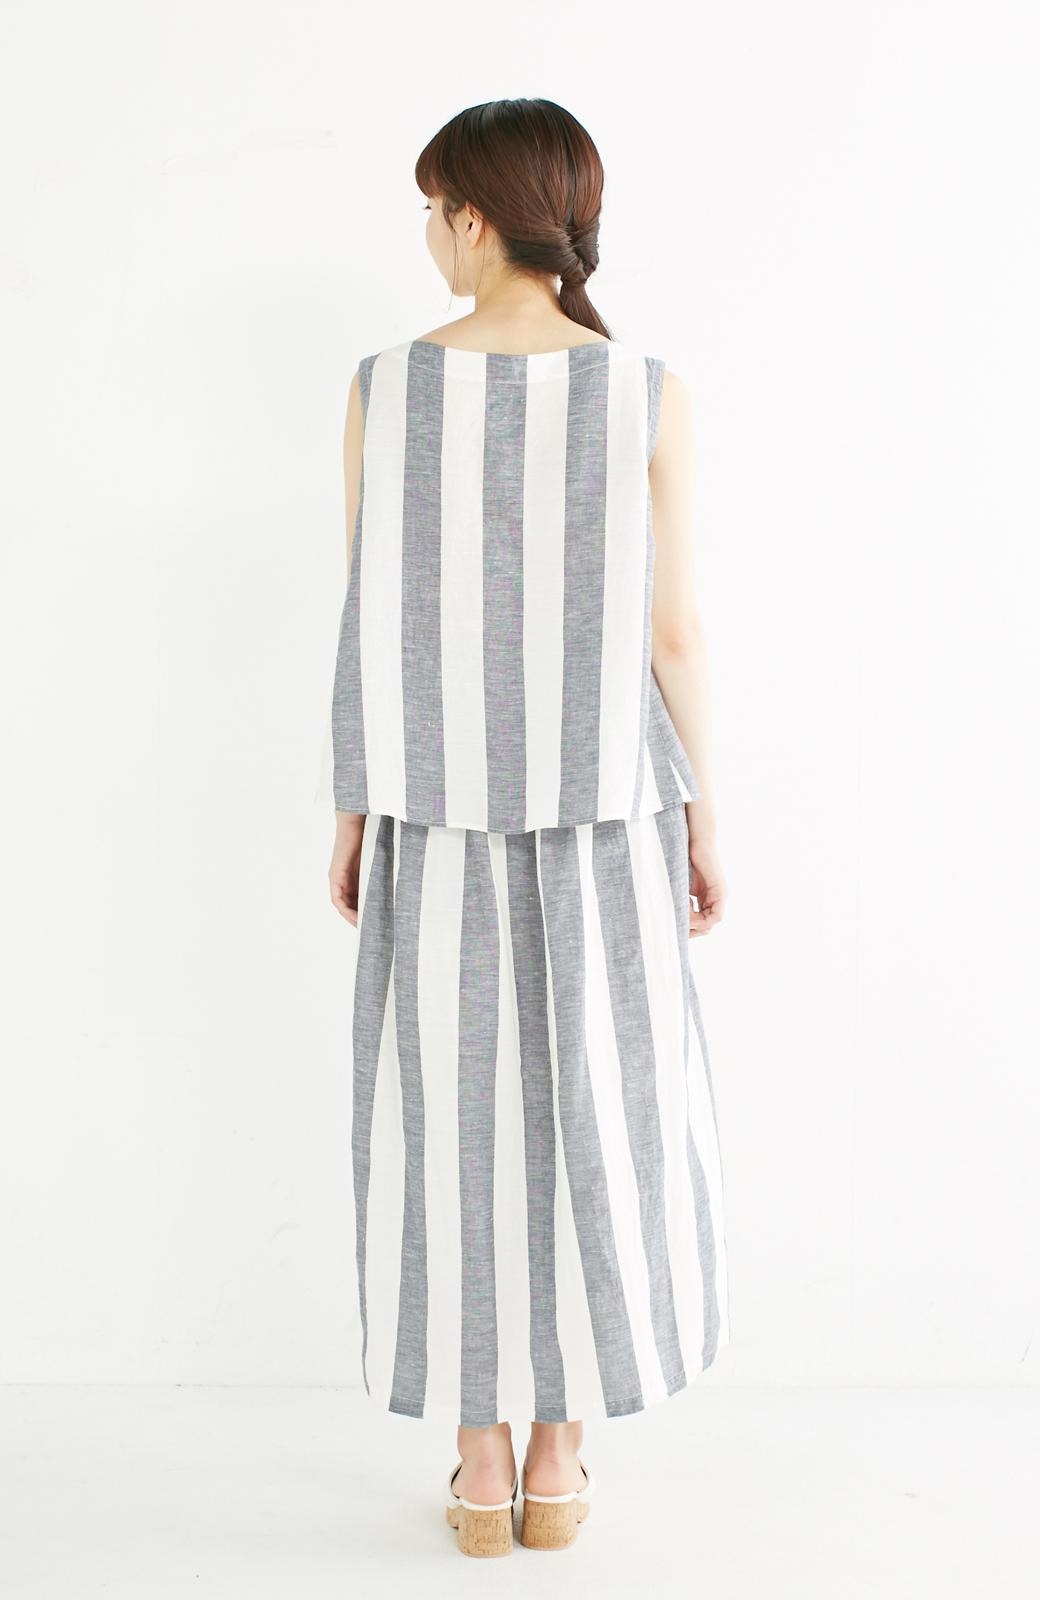 haco! てとひとて miho umezawa ストライプツーピースドレス <ホワイト×ブルー>の商品写真9